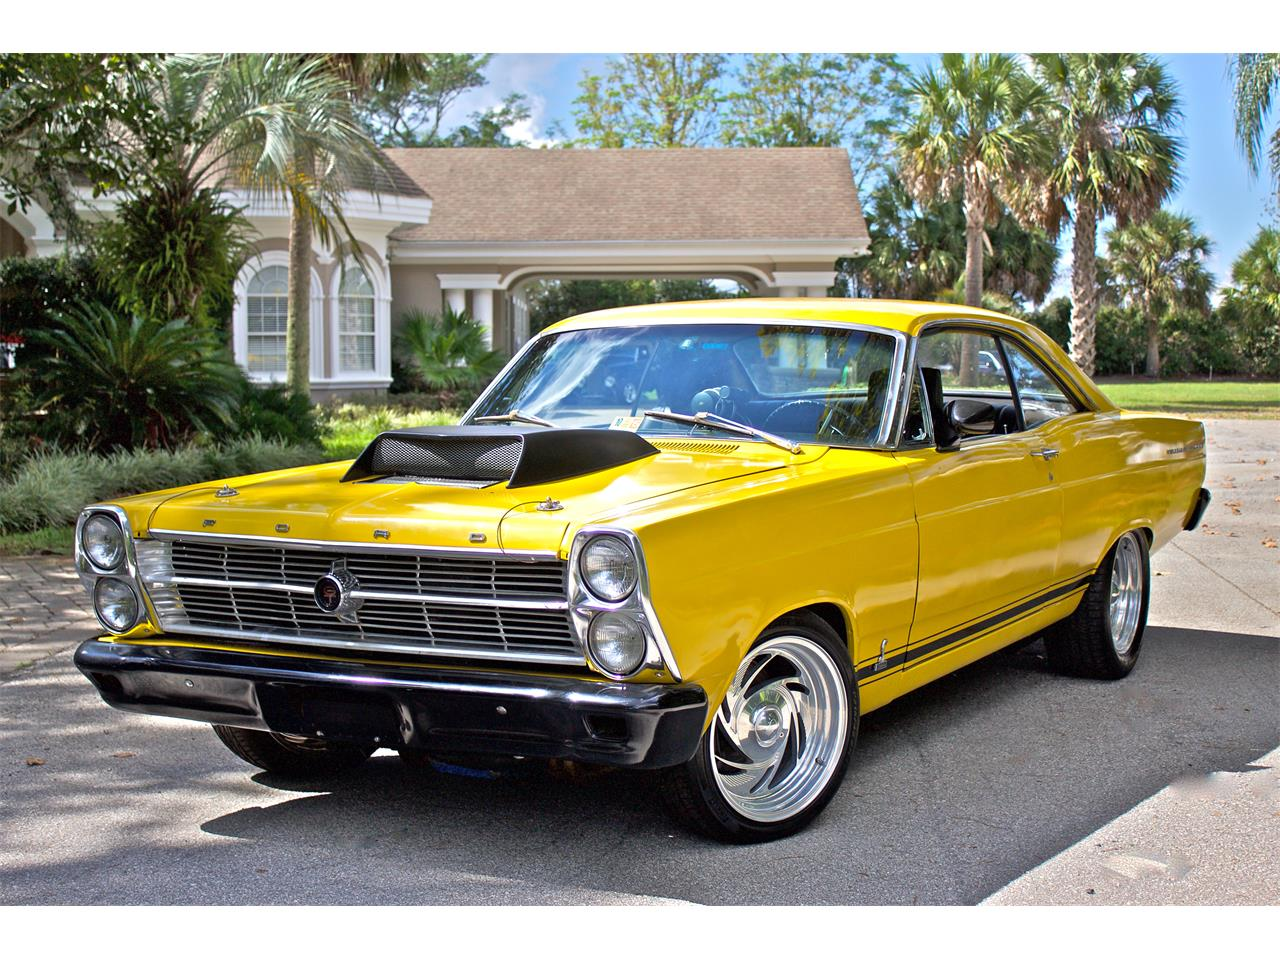 For Sale: 1966 Ford Fairlane in Eustis, Florida